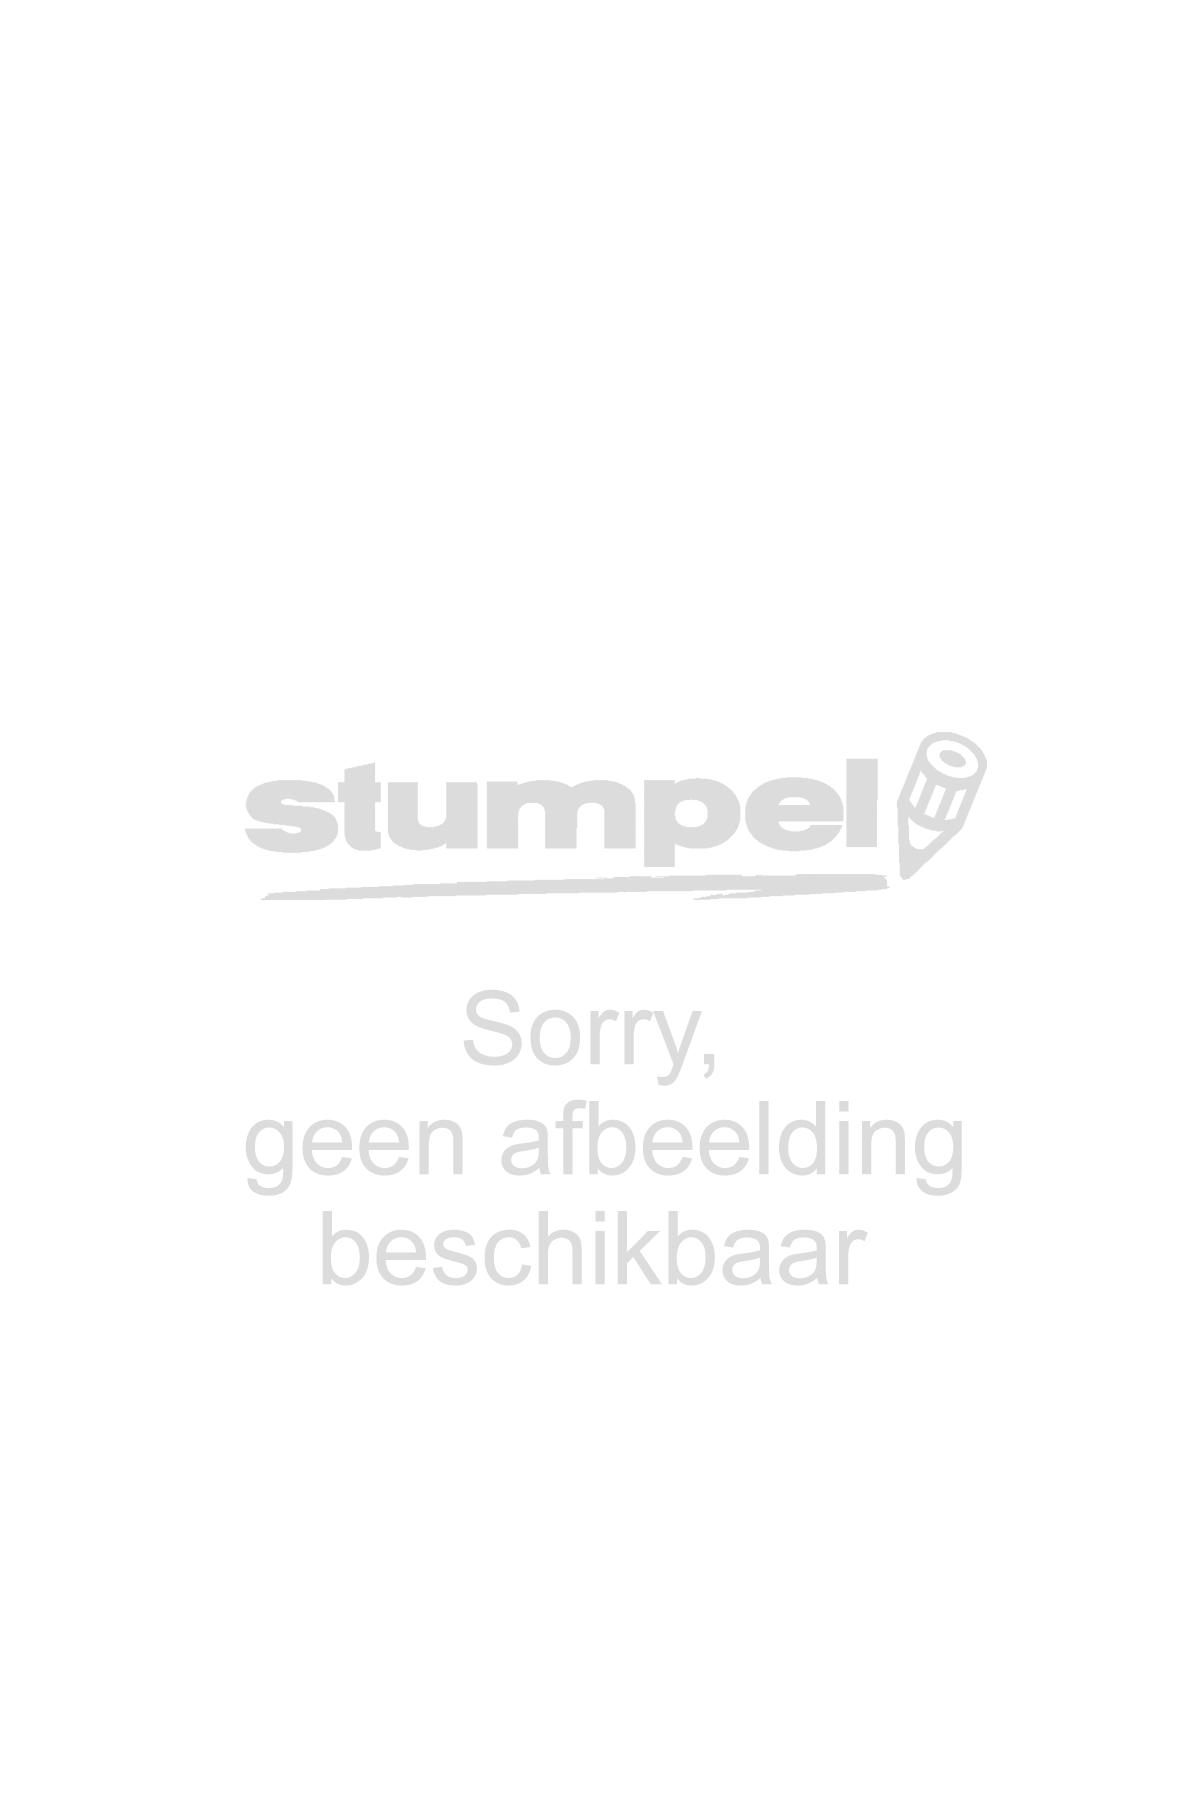 Toner Sharp MX-23GTBA, zwart, 18K